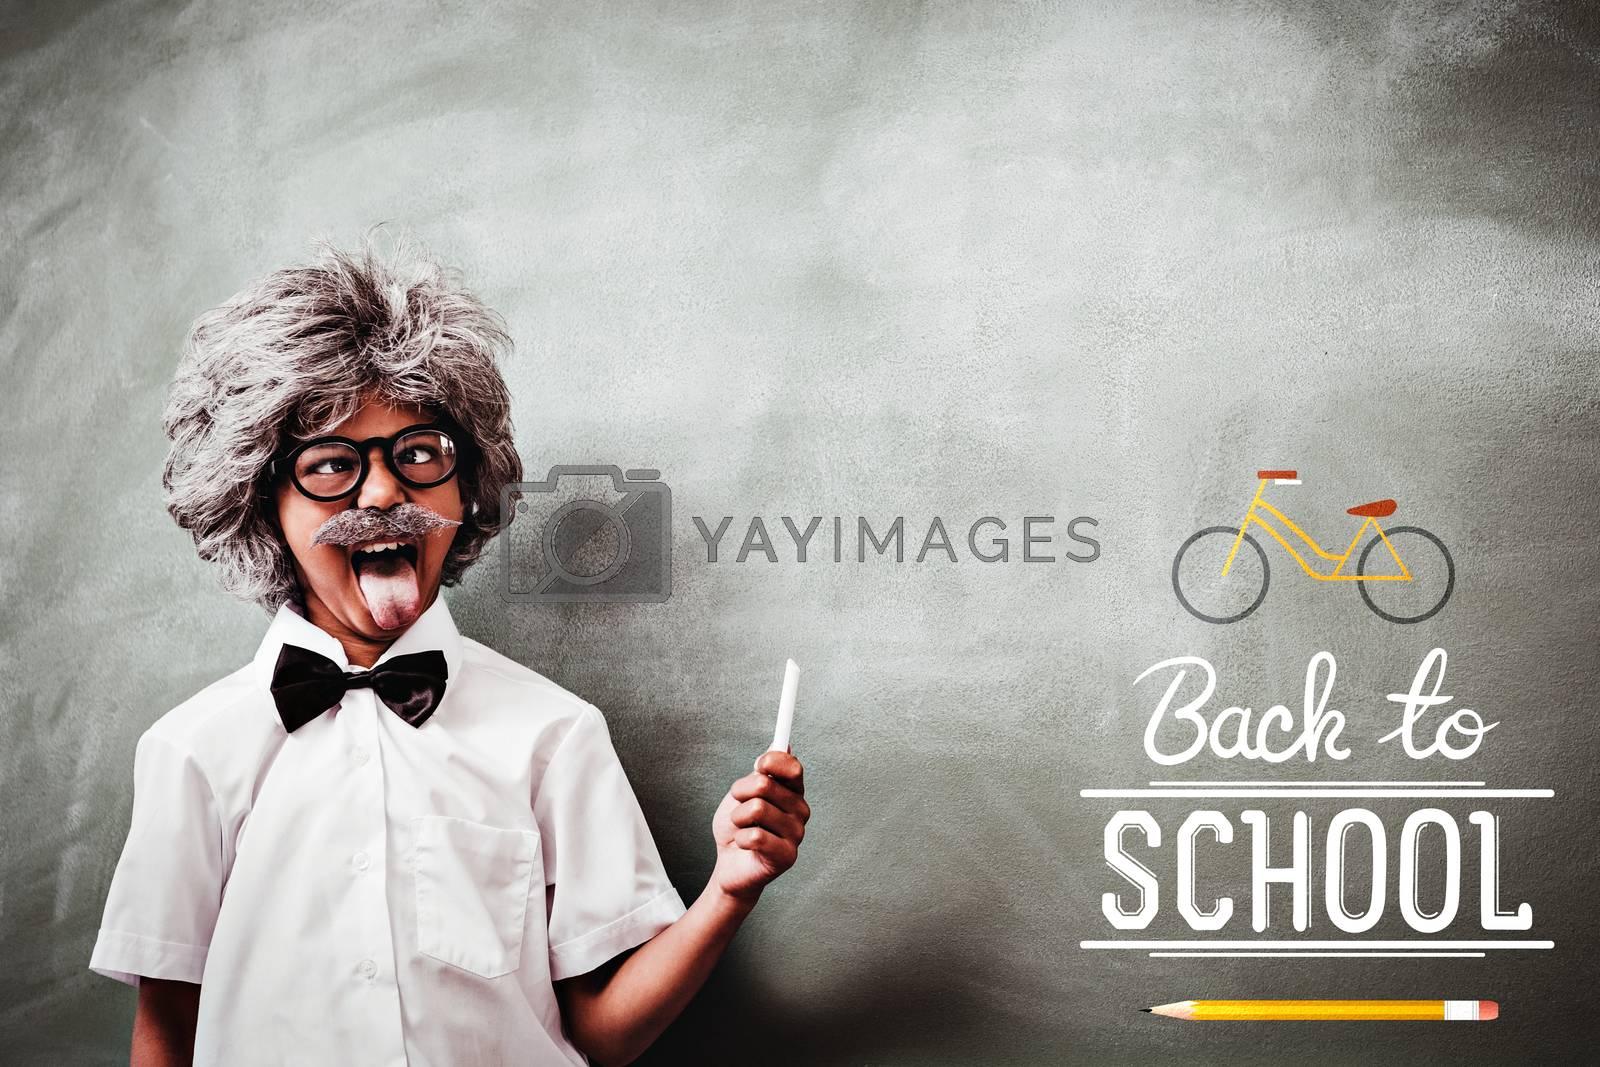 back to school against boy dressed as senior teacher in front of blackboard